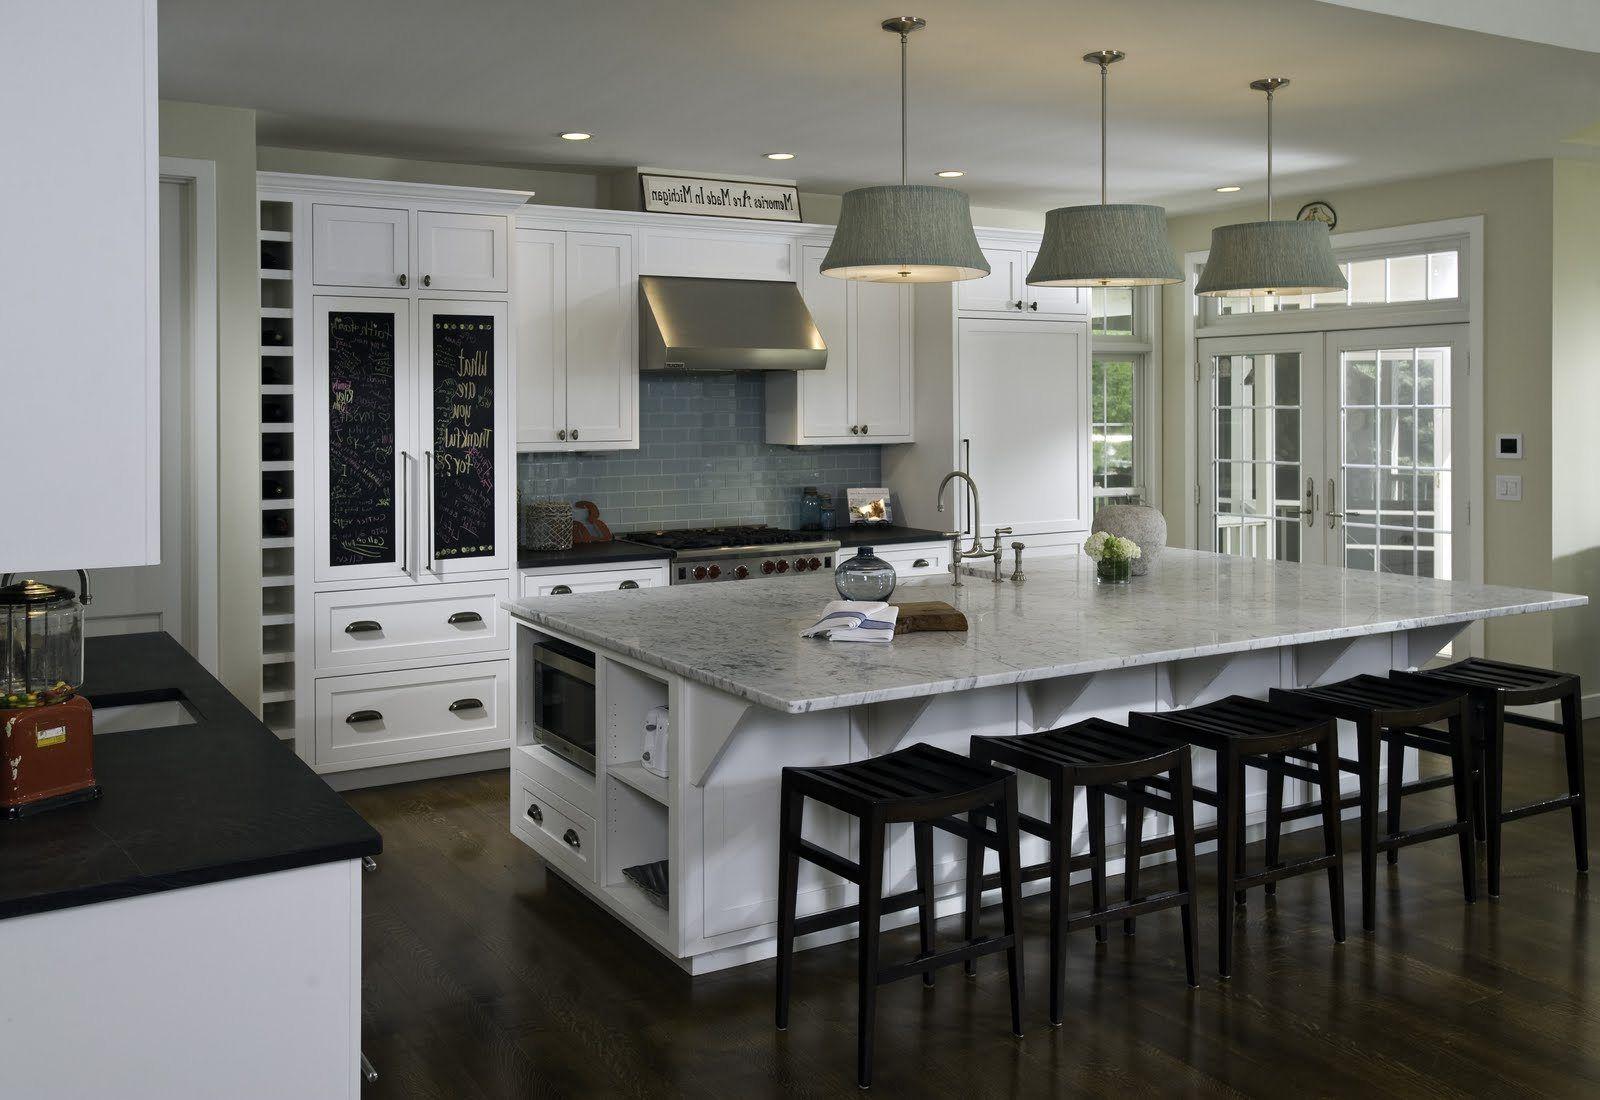 Resultado De Imagem Para Kitchen Island Ideas With Seating And Stove Modern White Kitchen Island Kitchen Island With Sink Kitchen Design